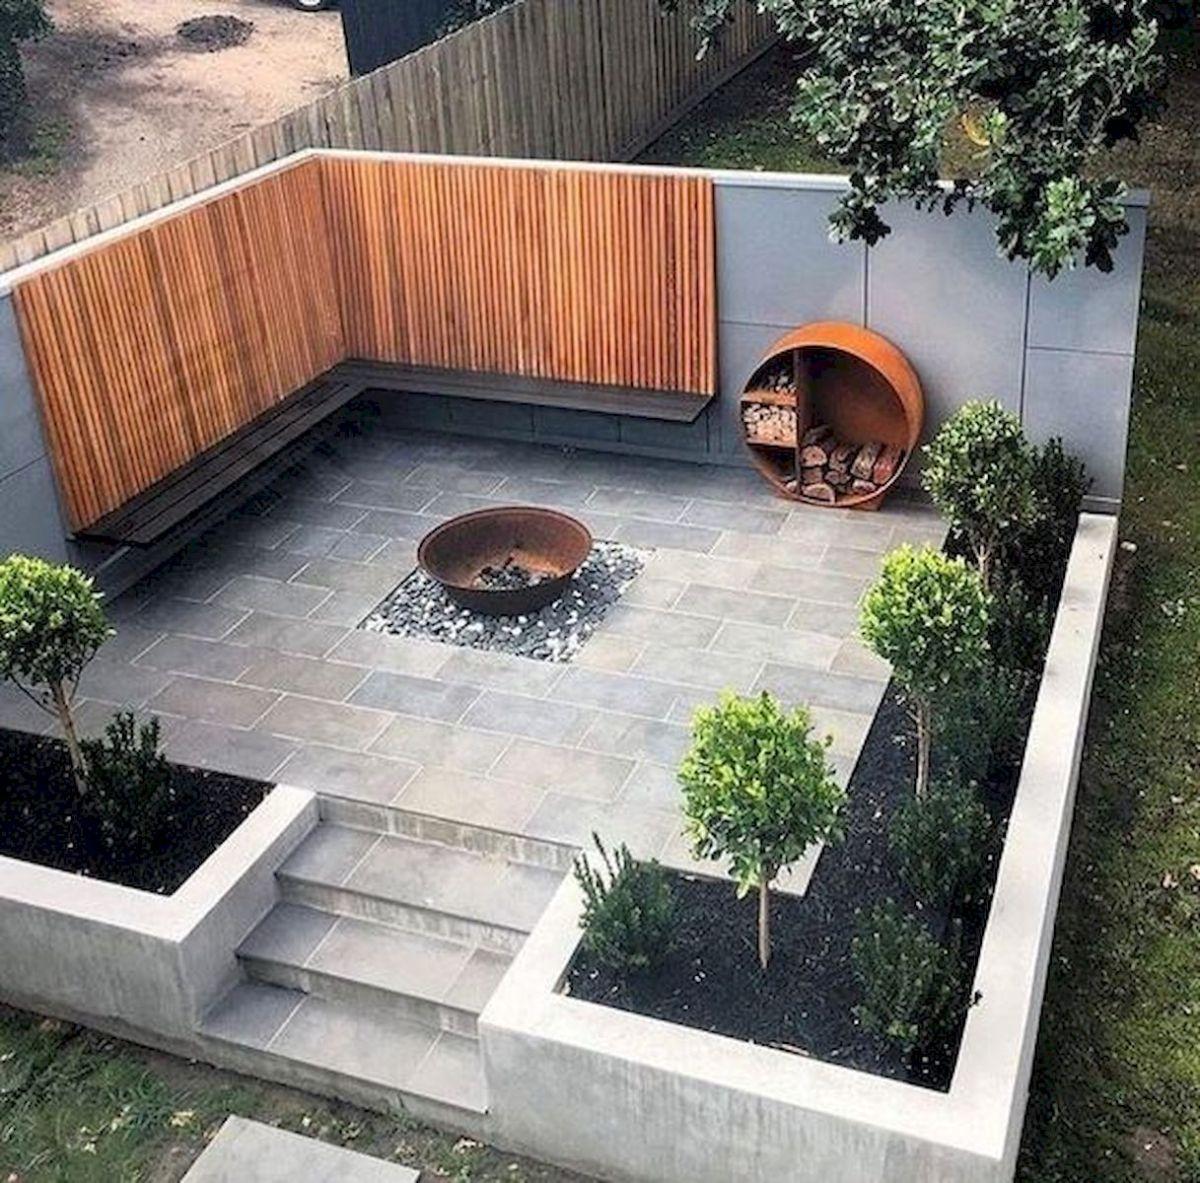 40 Fabulous Modern Garden Designs Ideas For Front Yard and Backyard (14)